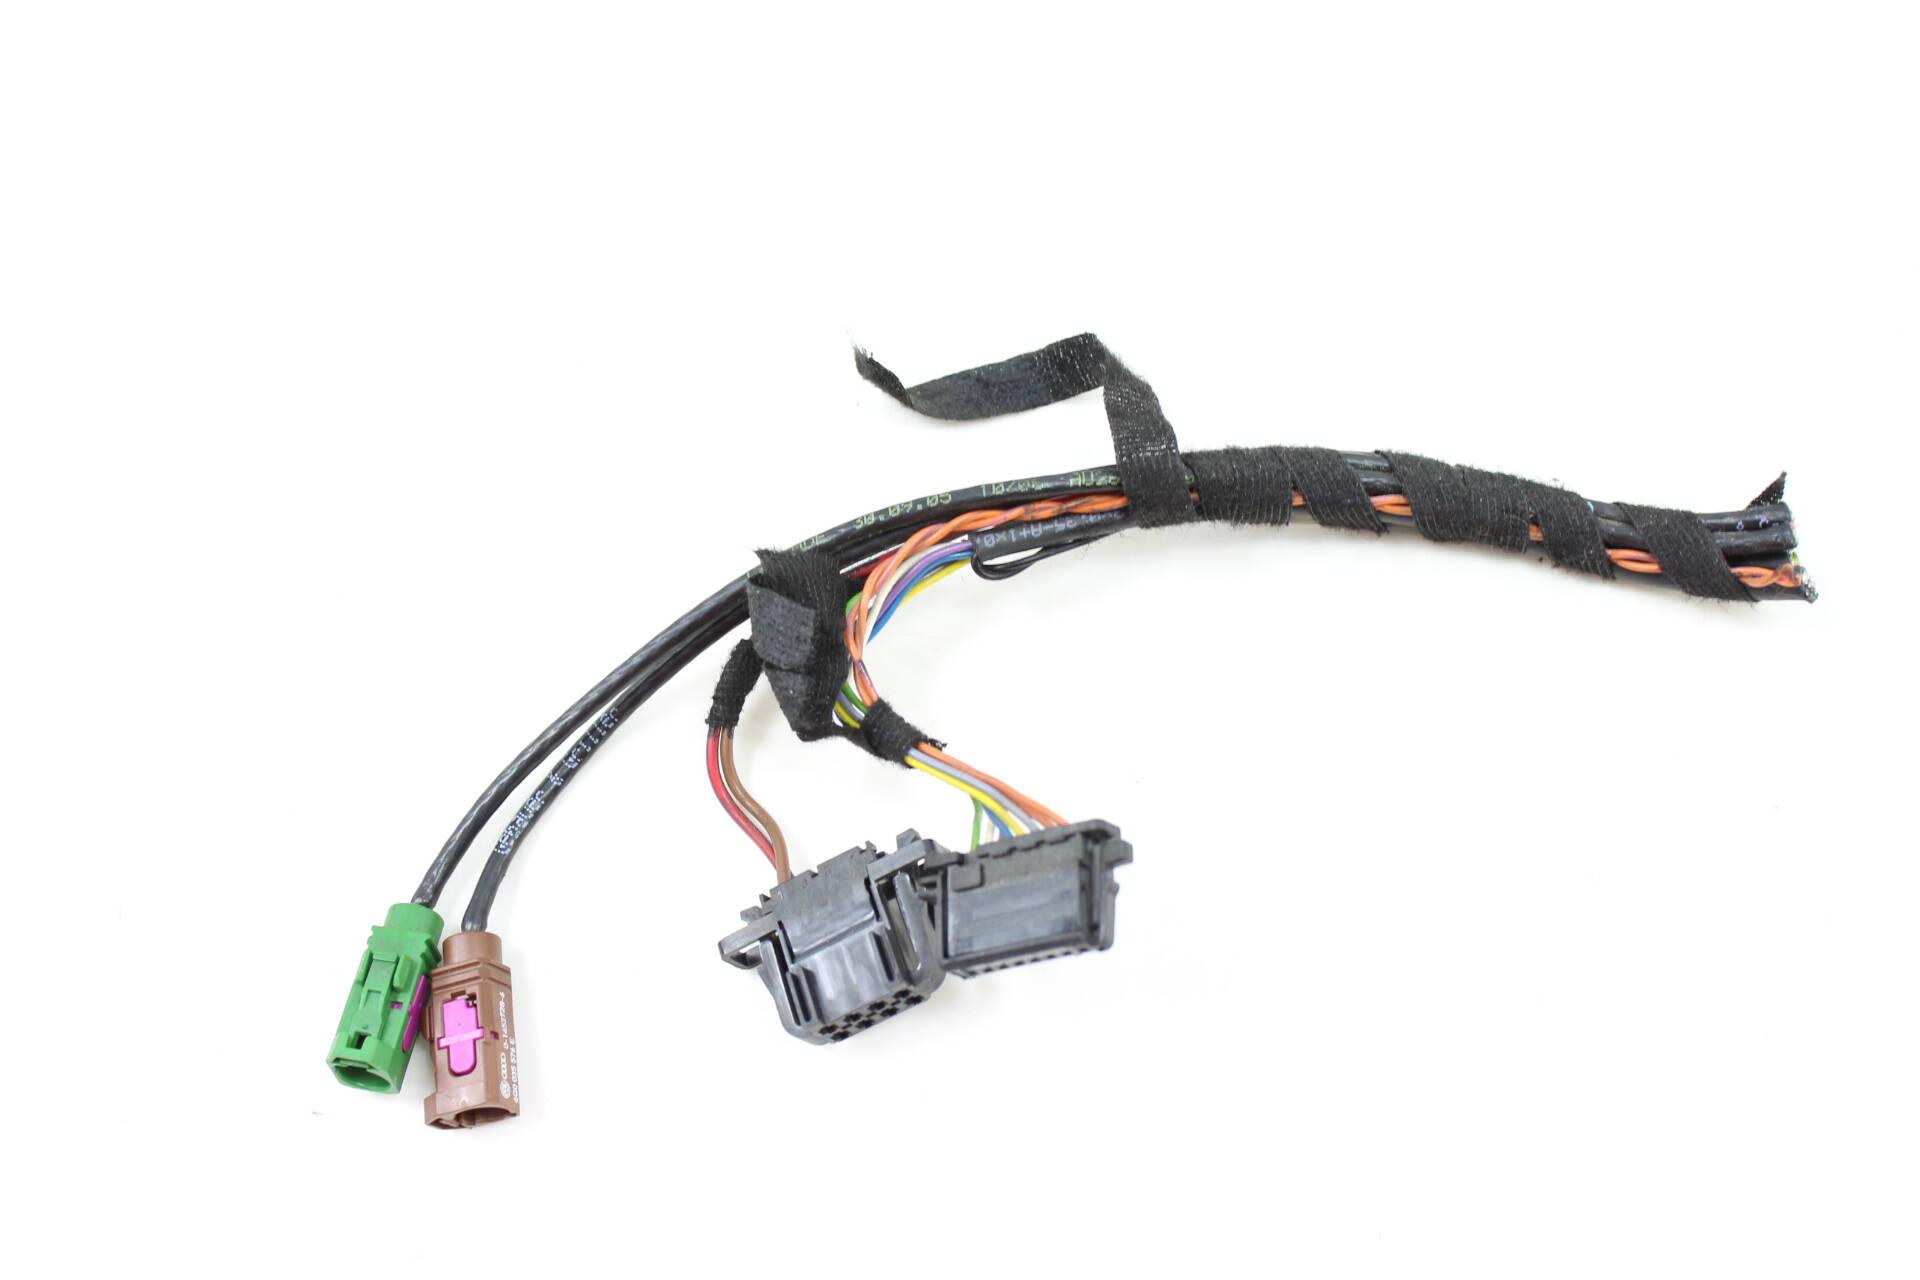 satellite wire harness wiring diagram user satellite wire harness schematic diagram database satellite wire harness